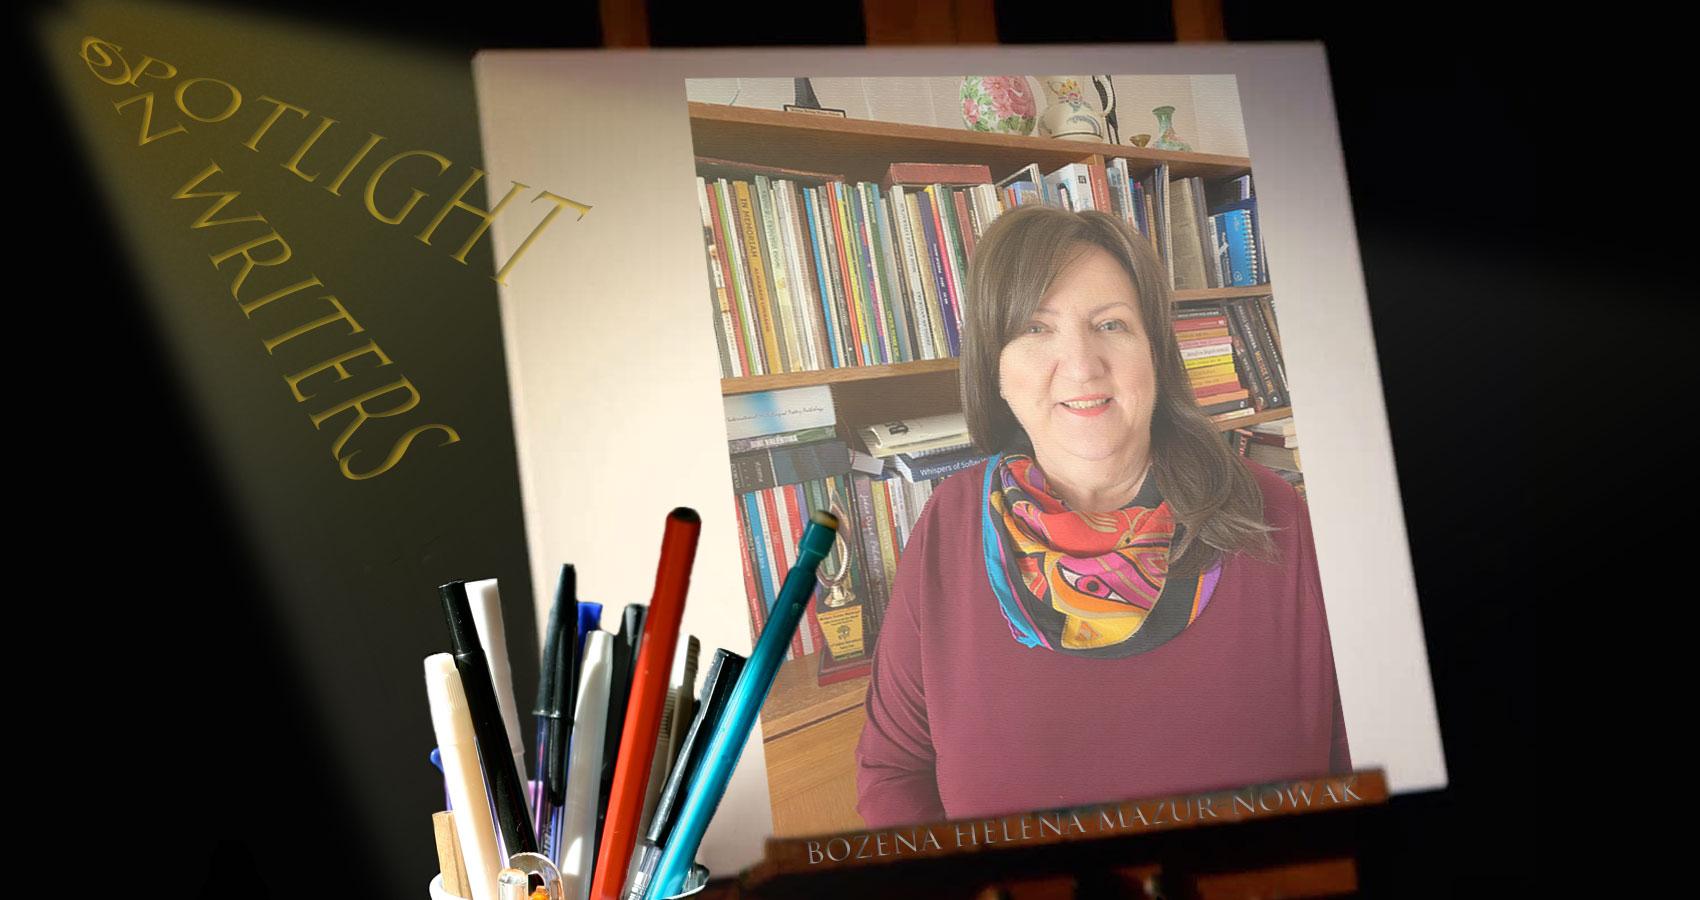 Spotlight On Writers - Bozena Helena Mazur-Nowak, an interview at Spillwords.com